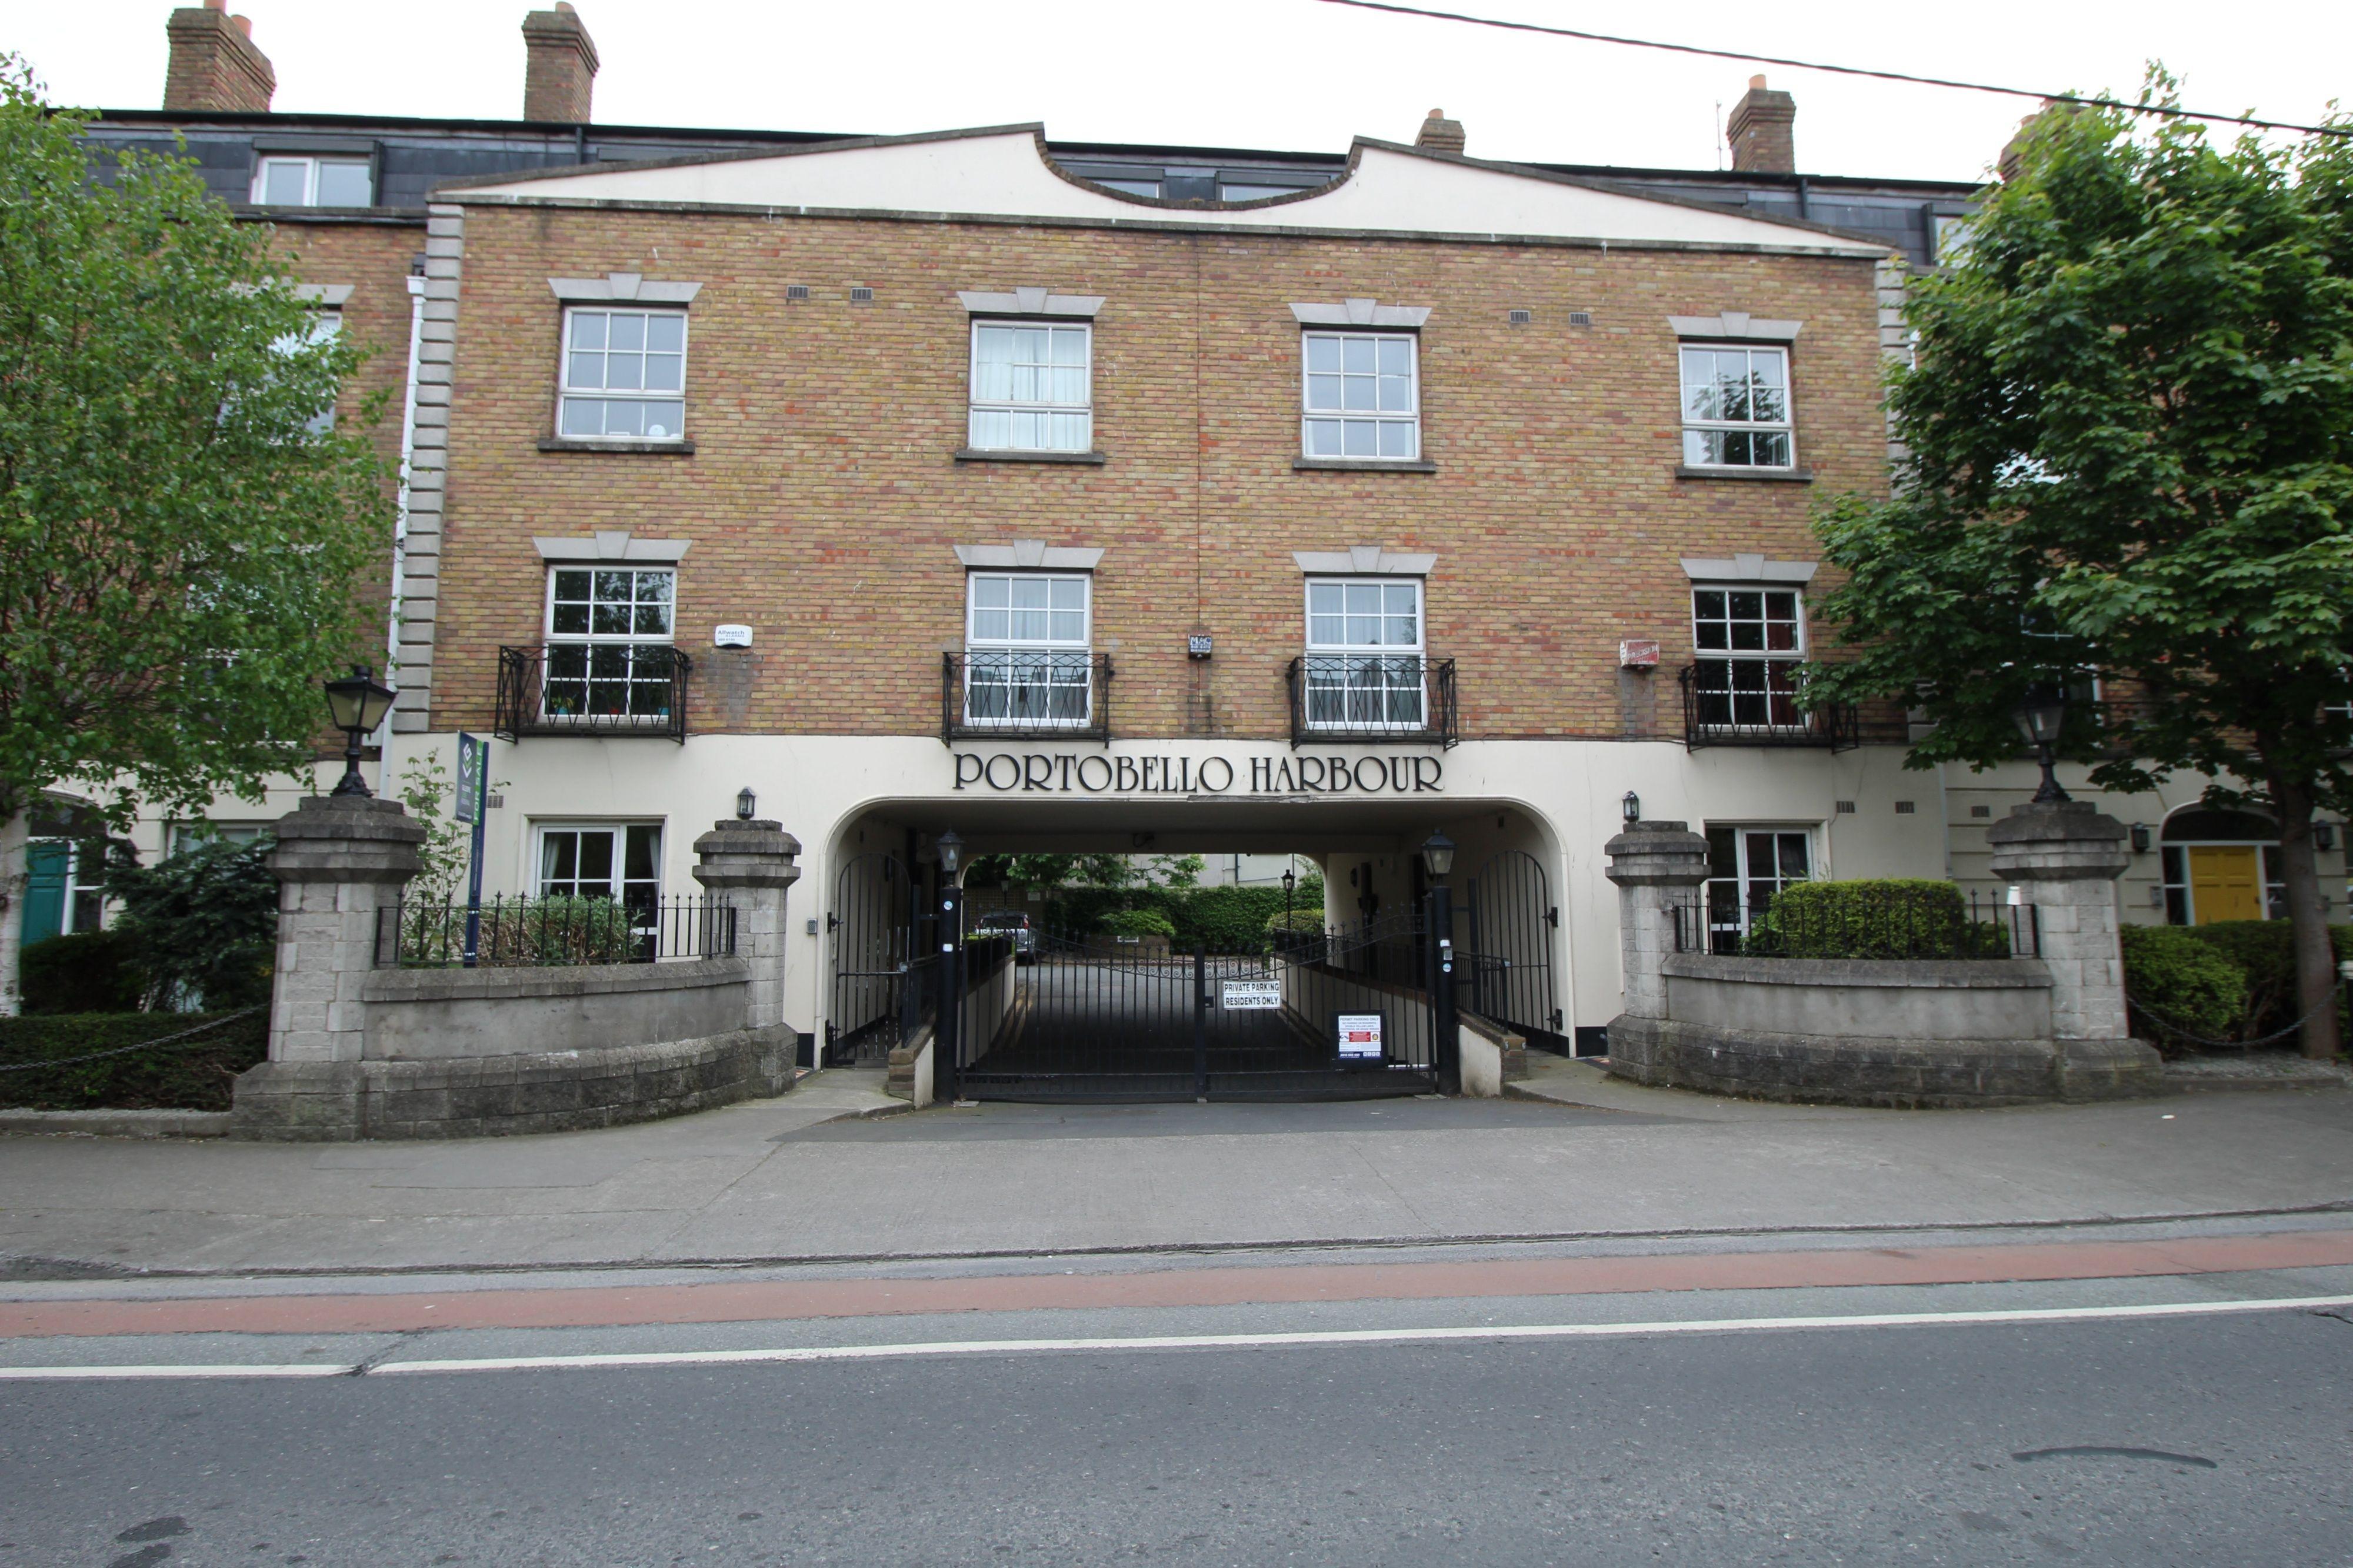 Portobello Harbour, Grove Road, Rathmines, Dublin 6